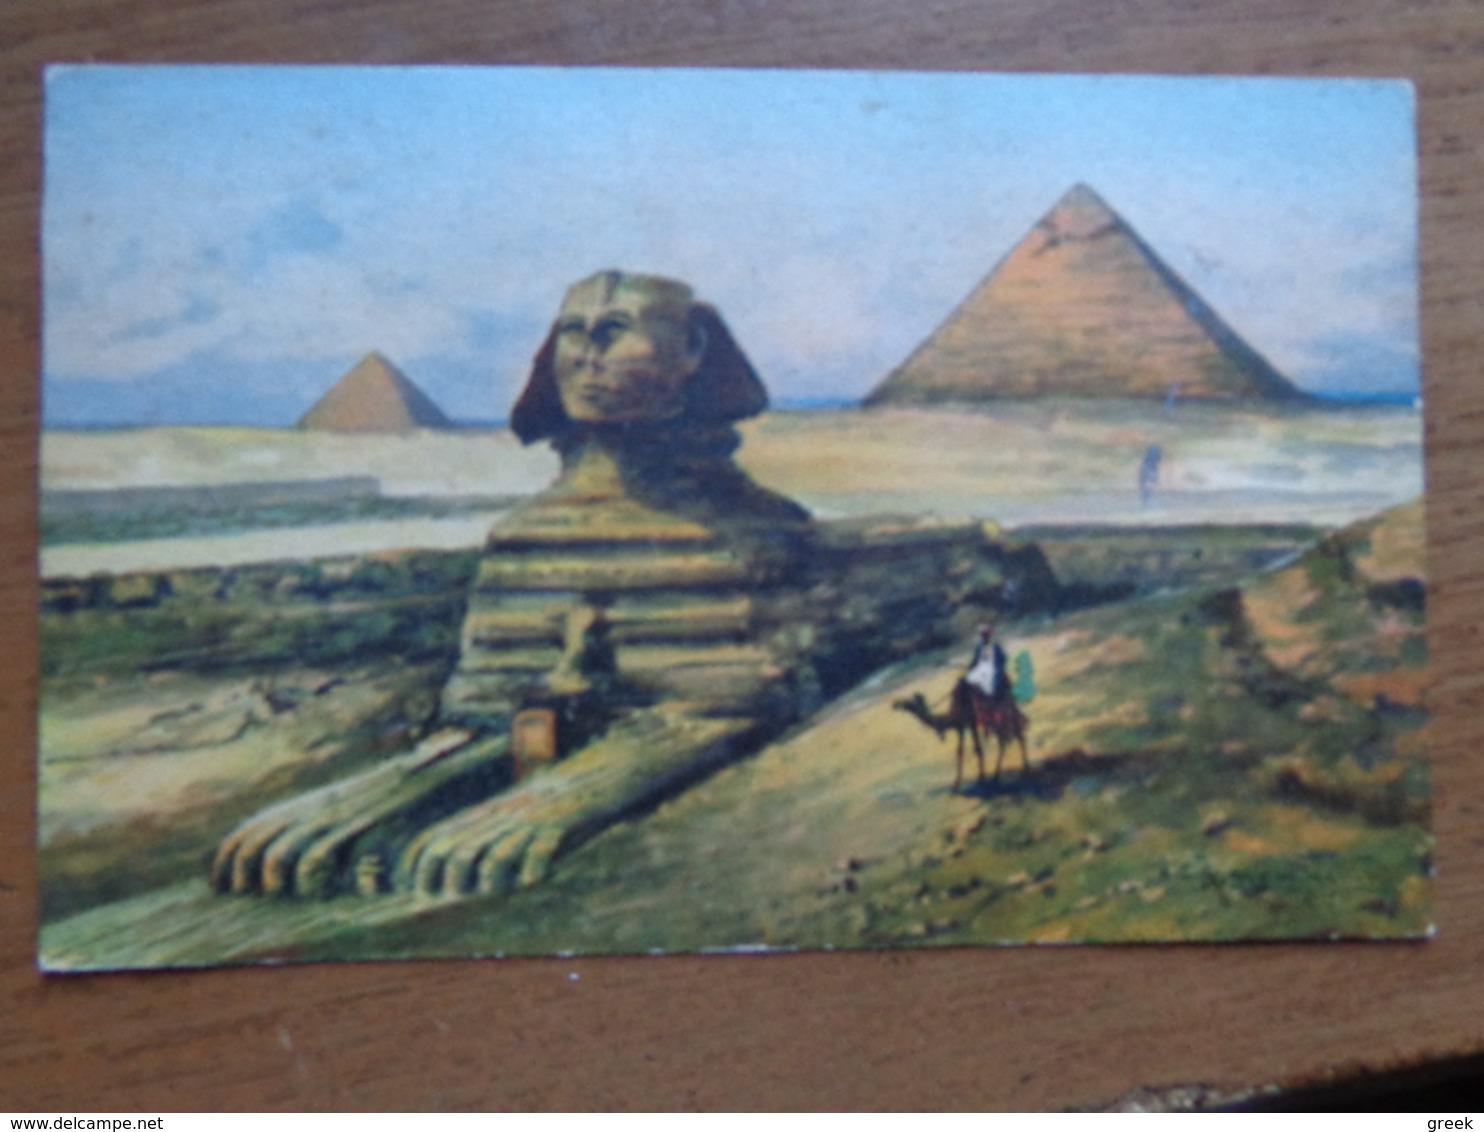 Kameel, Camel / Egypt, Cairo --> Written - Animaux & Faune